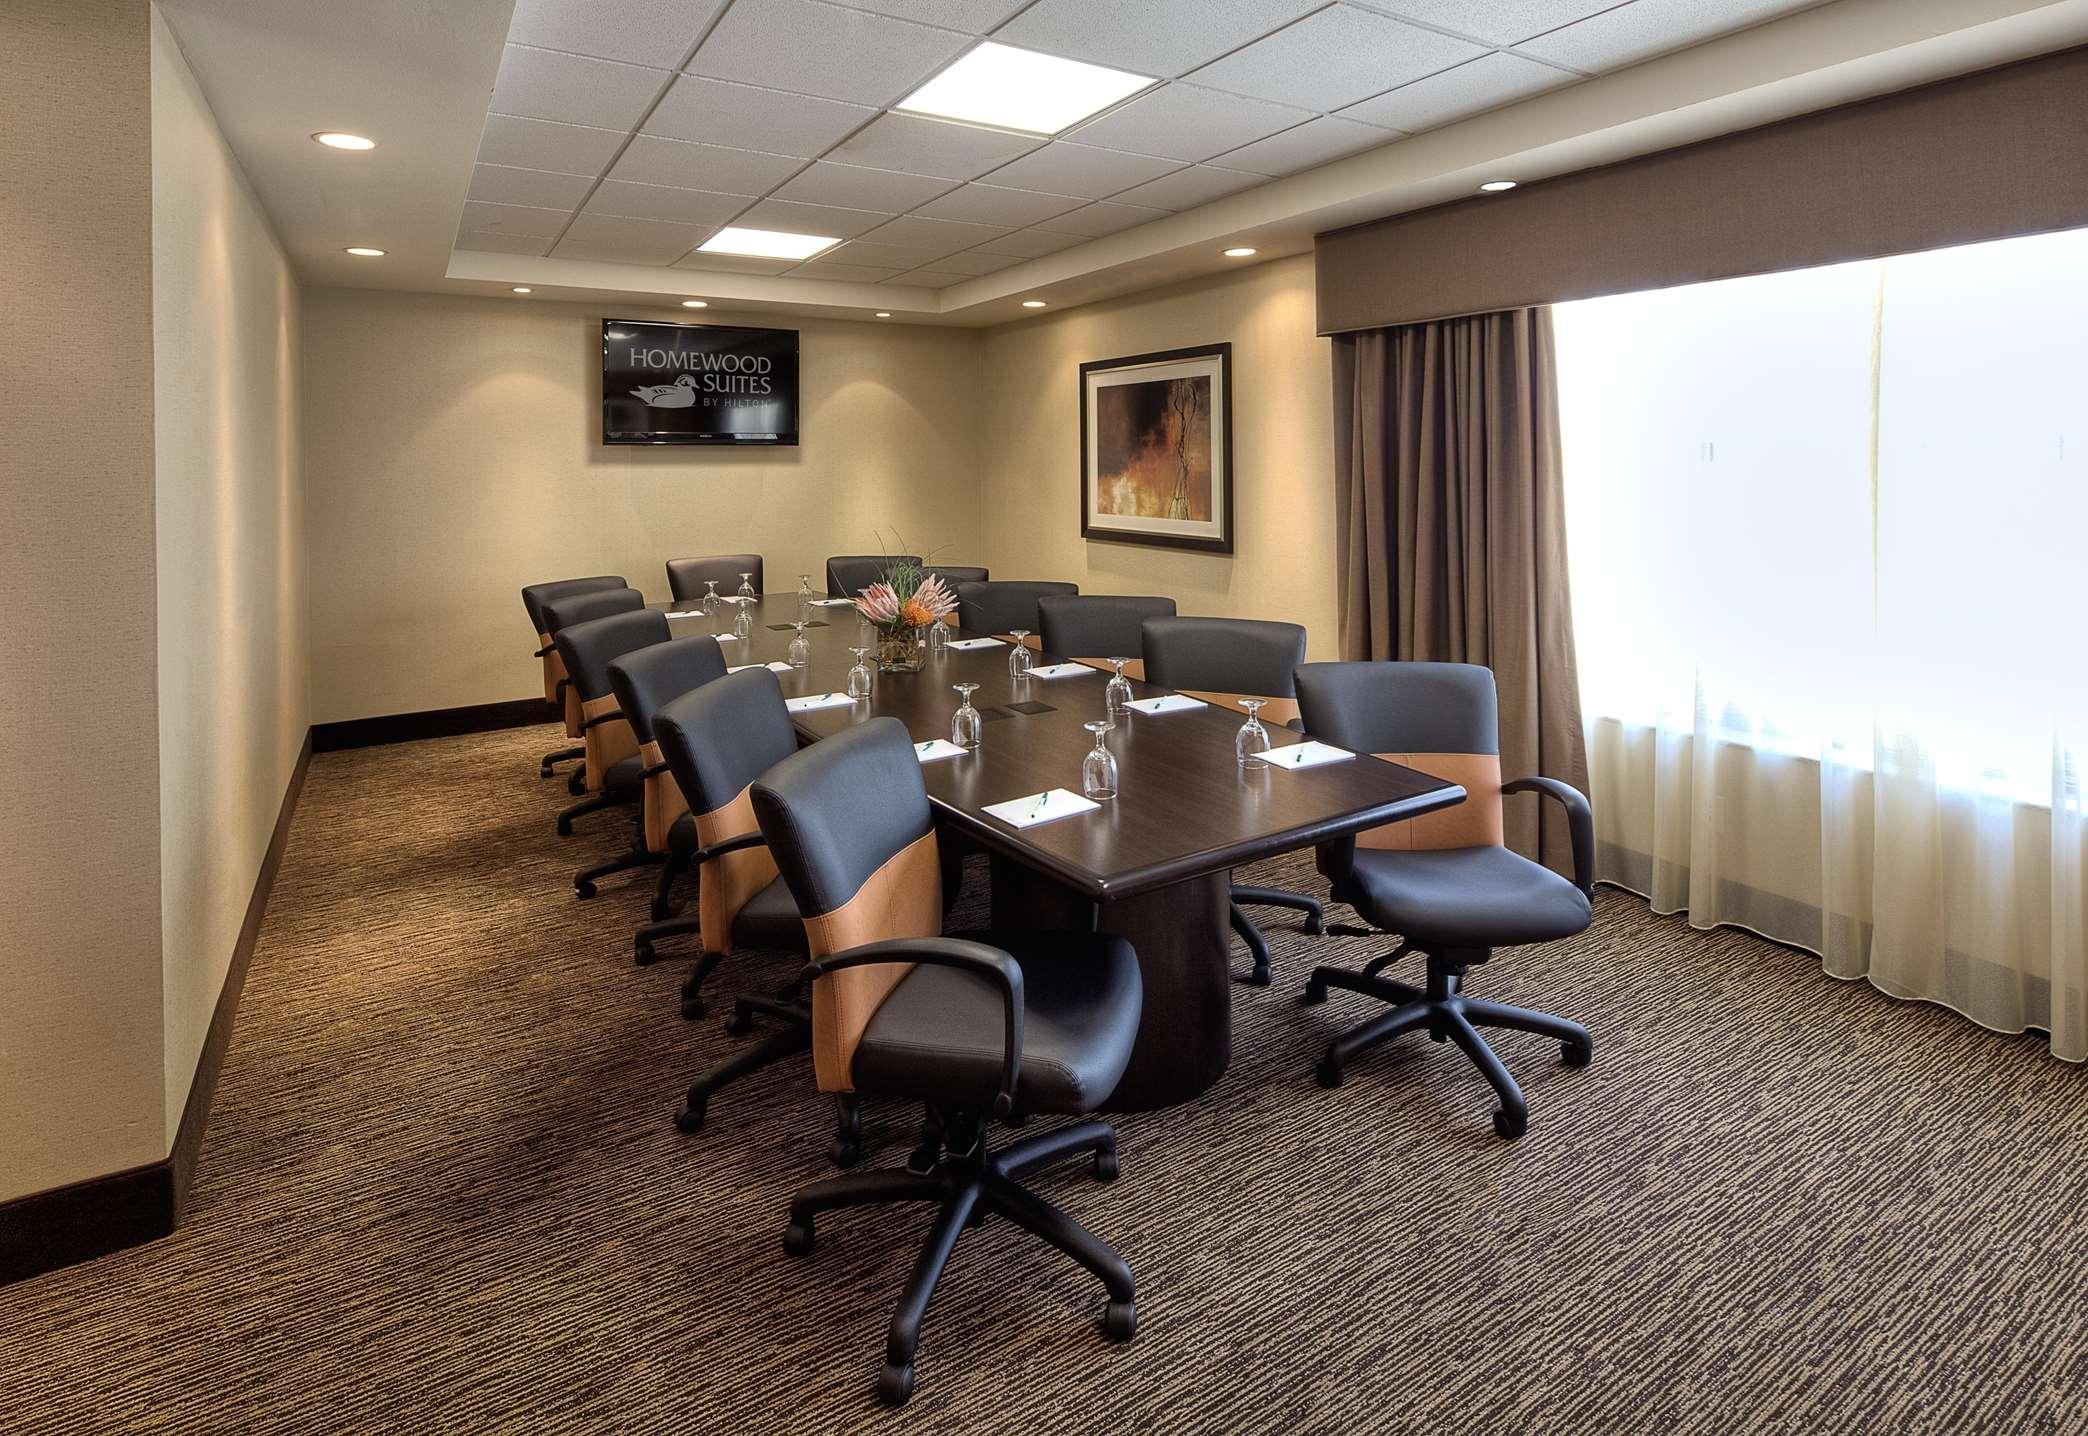 Homewood Suites by Hilton Victoria, TX image 16